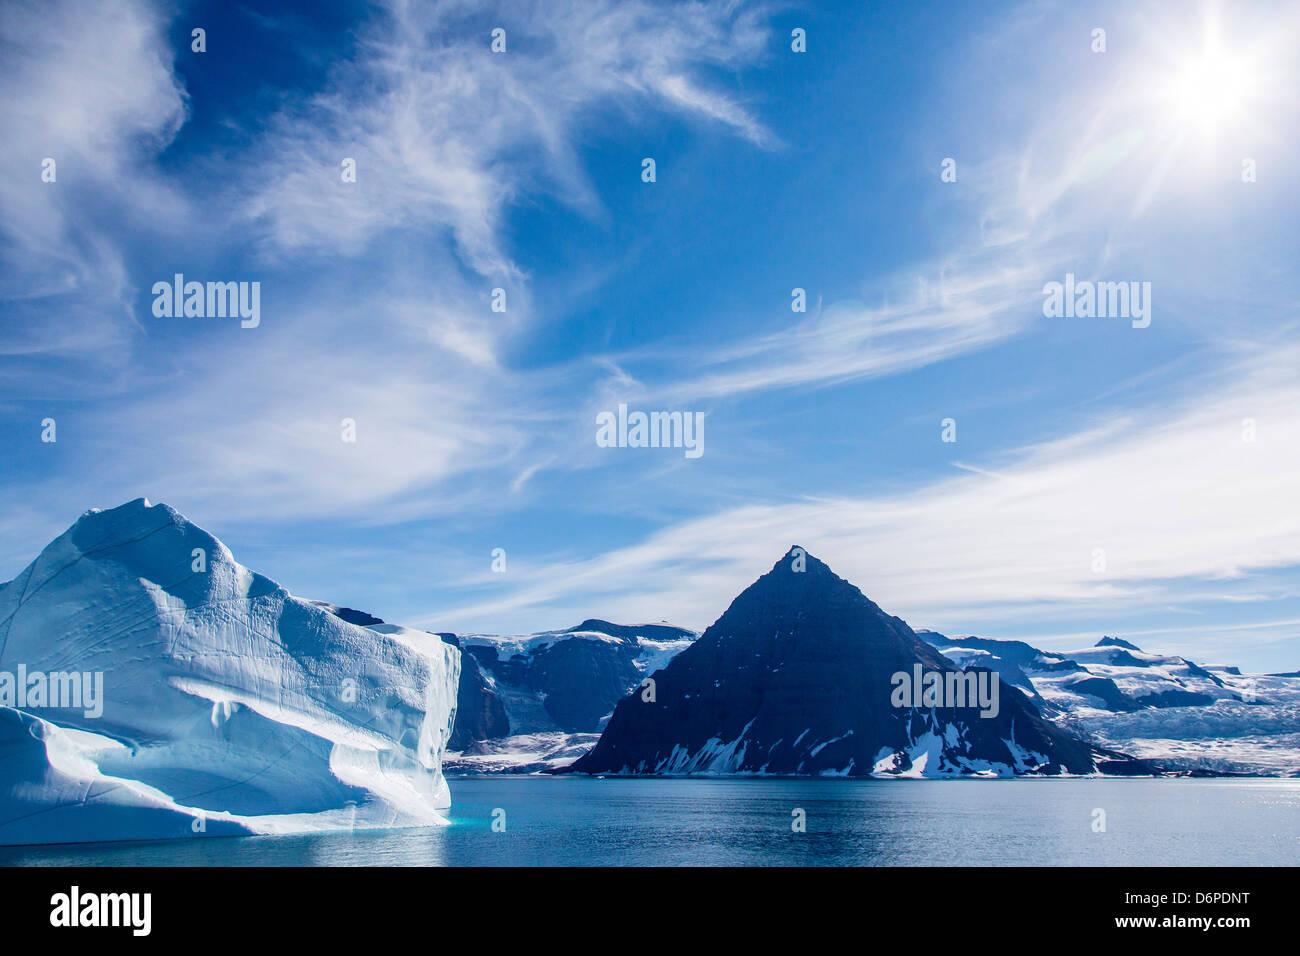 Huge iceberg, Scoresbysund, Northeast Greenland, Polar Regions - Stock Image